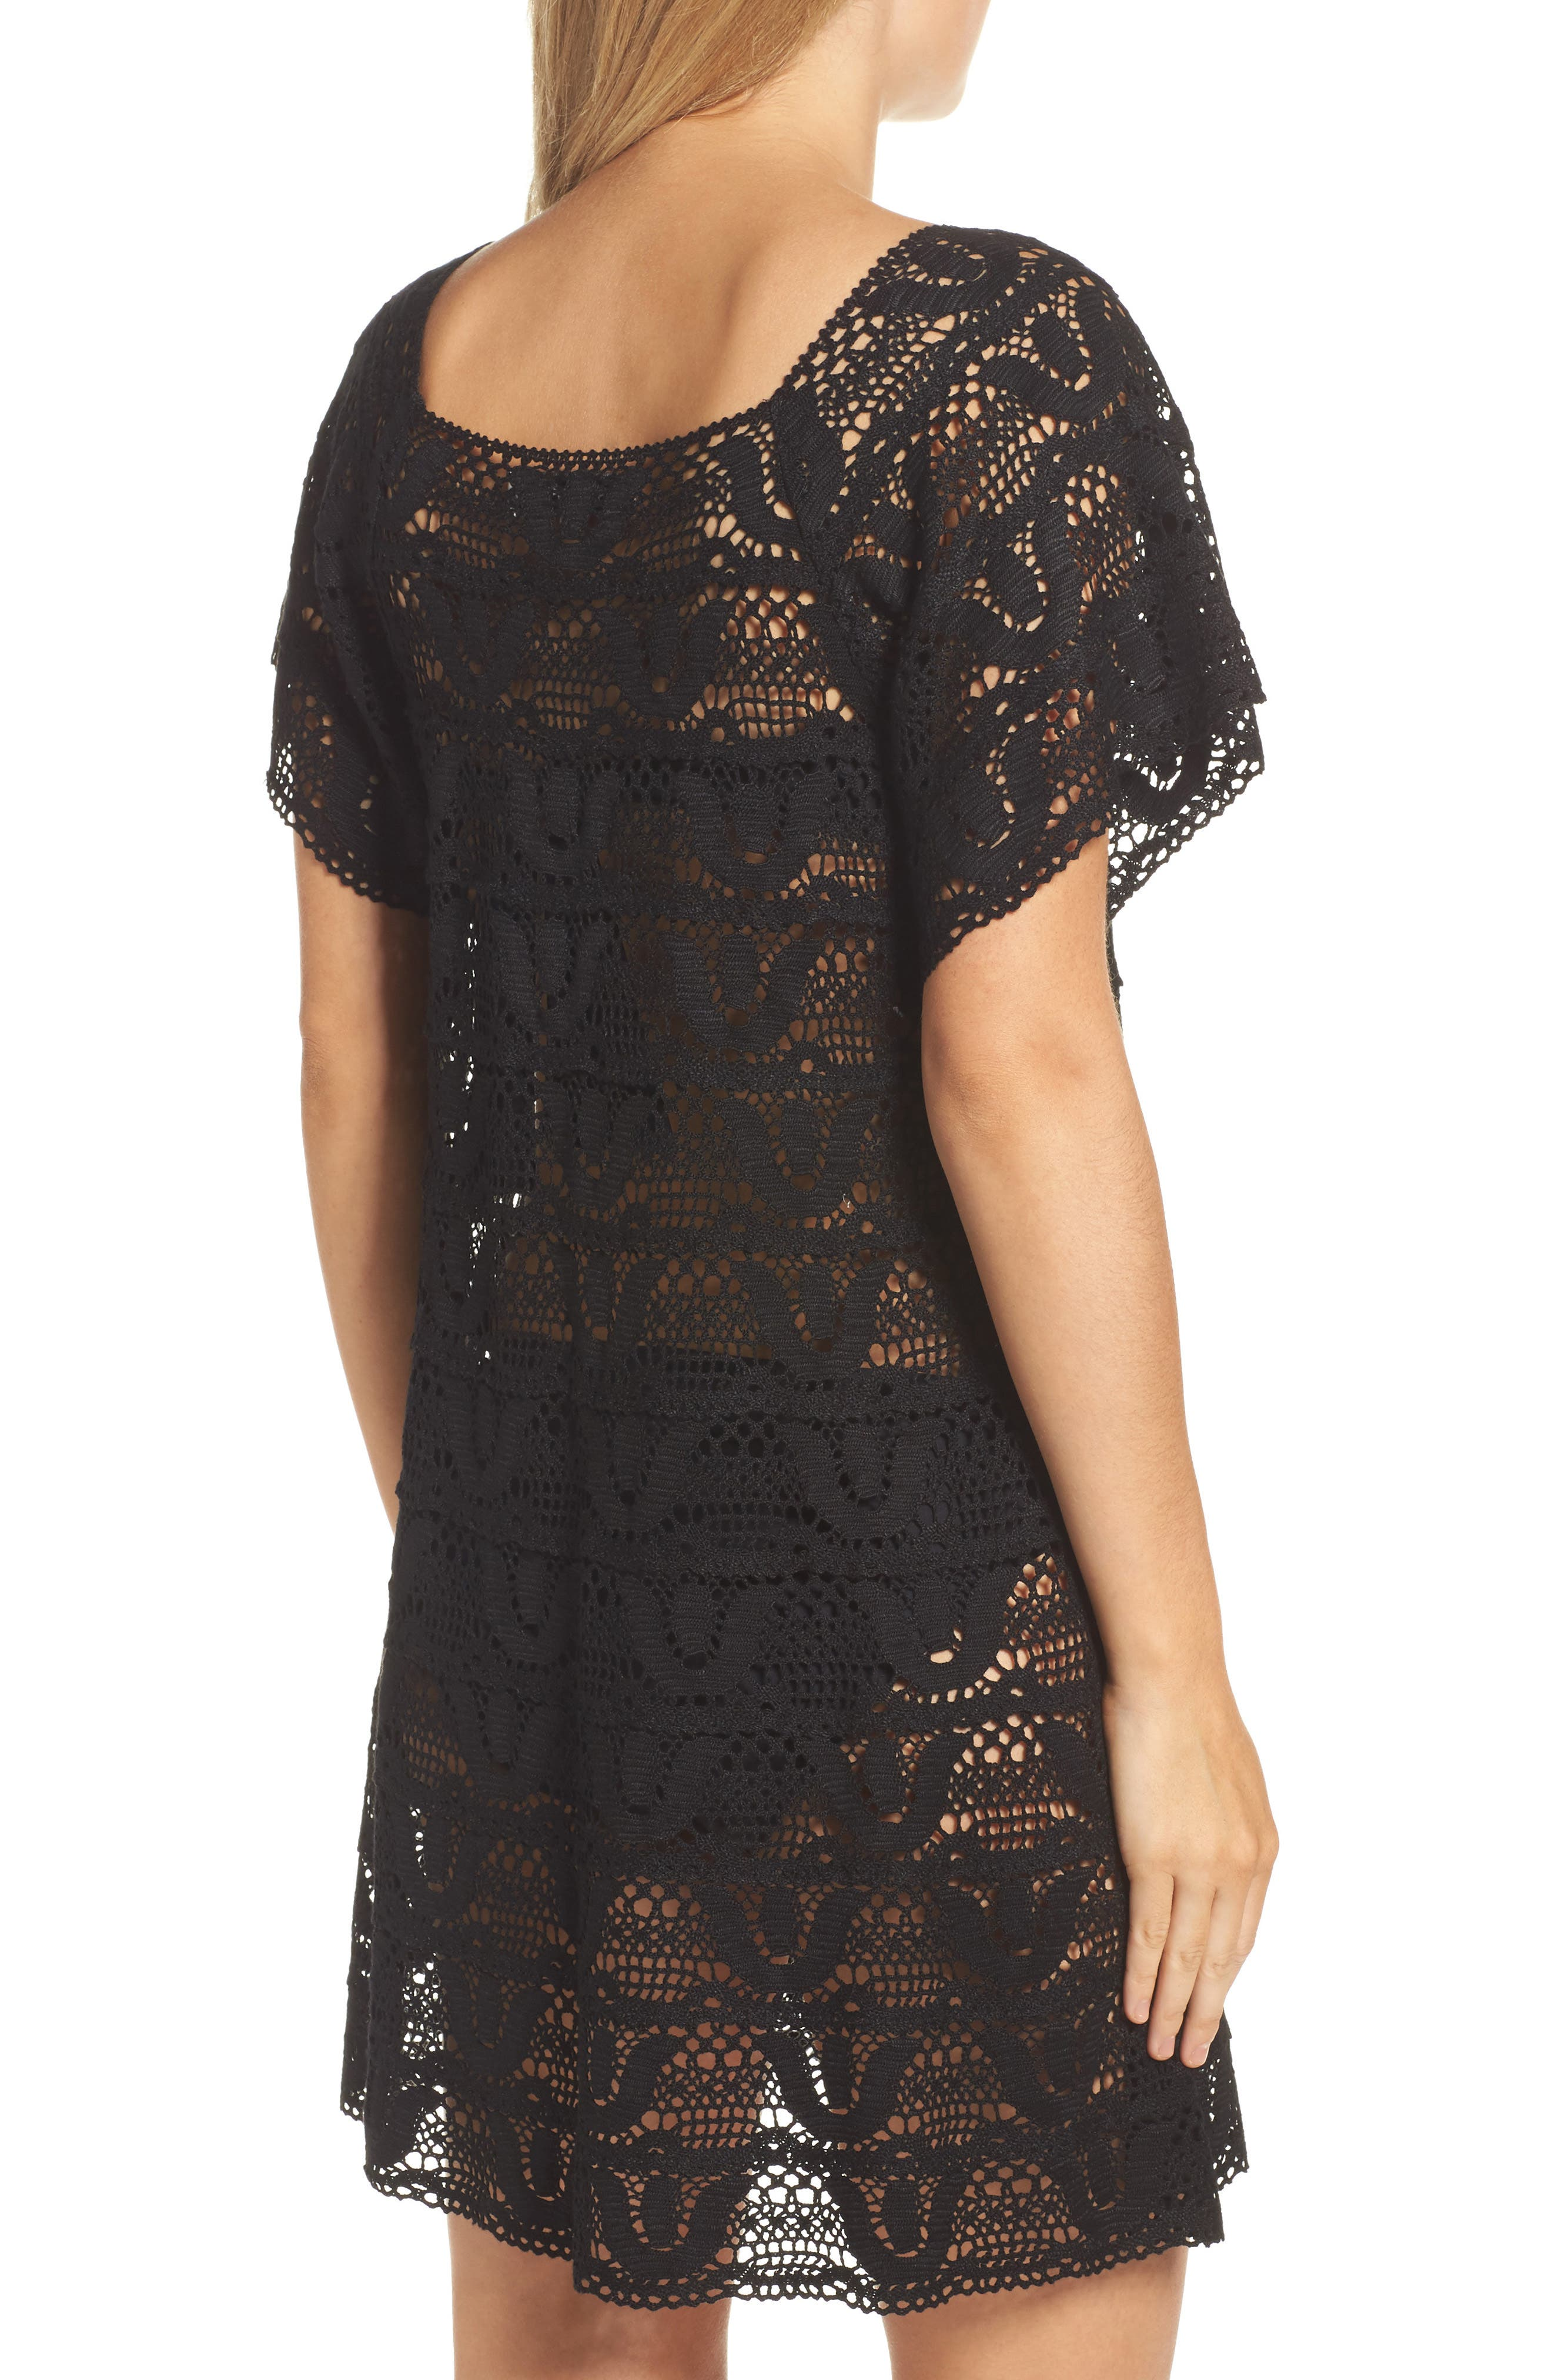 Nanette Lapore Crochet Cover-Up Dress,                             Alternate thumbnail 2, color,                             001